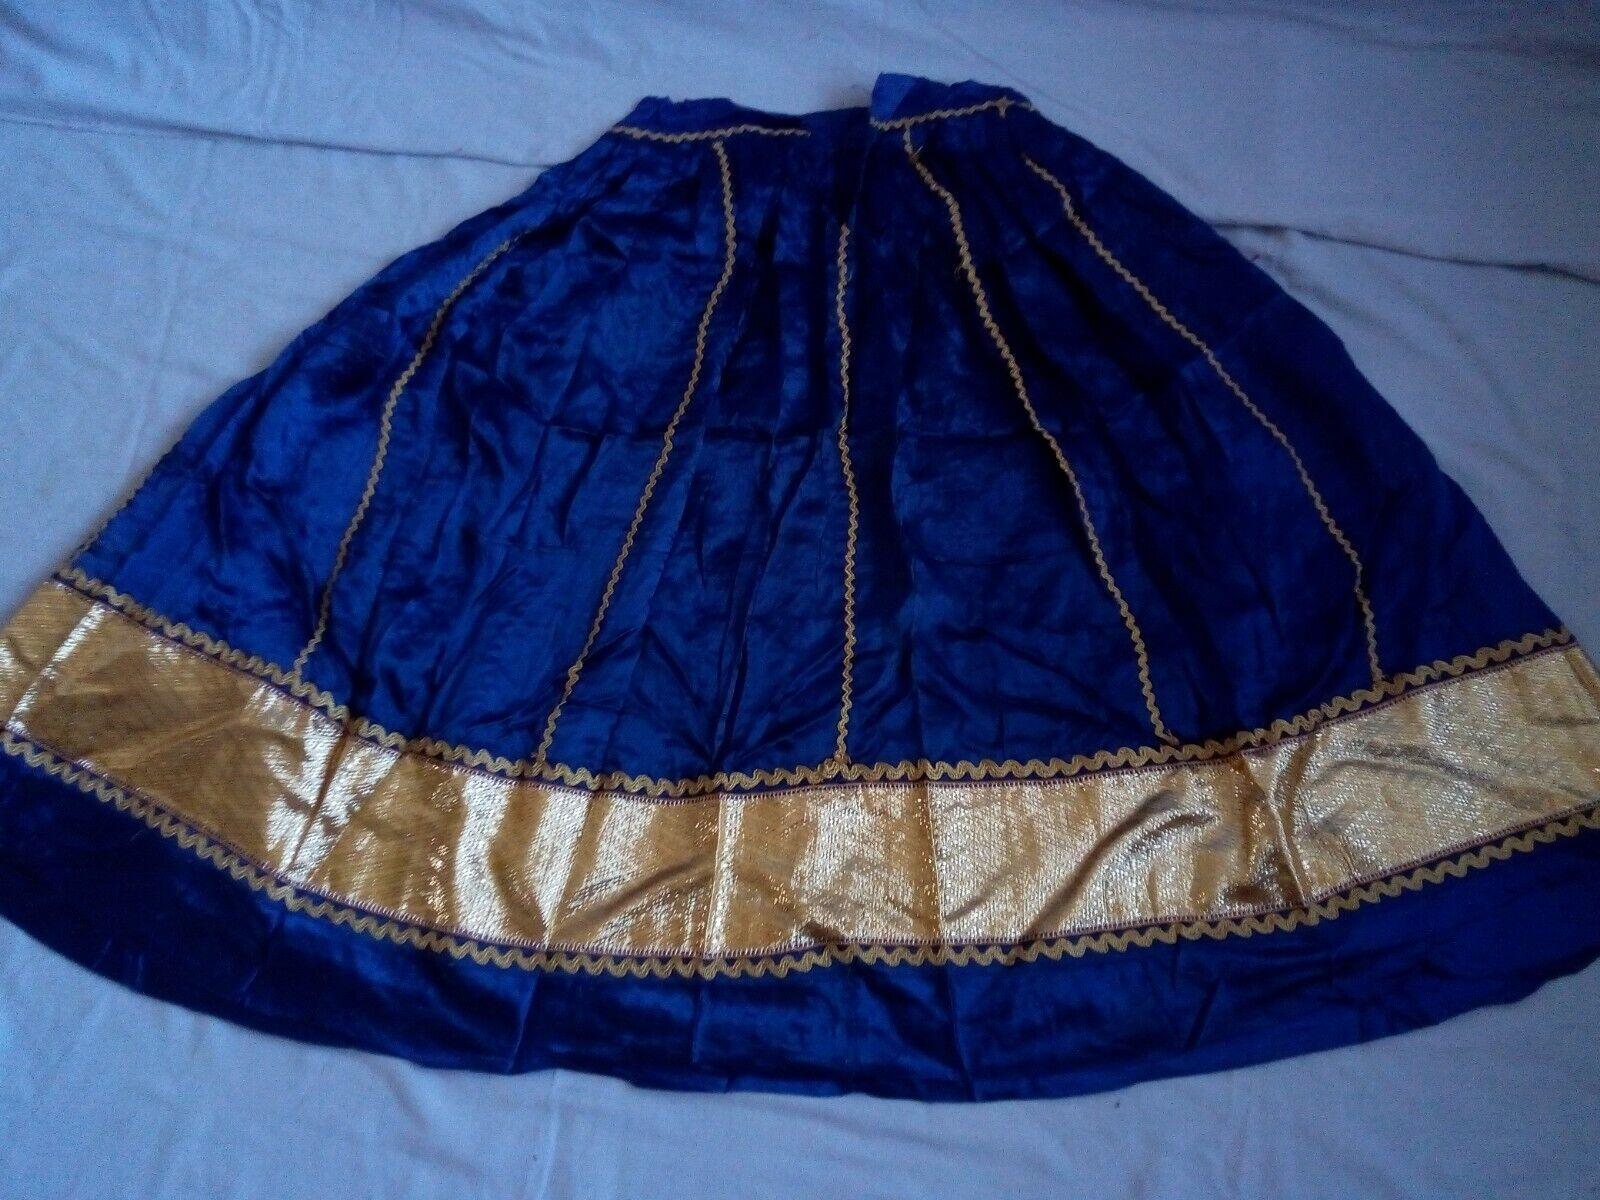 Indian Vintage Satin Silk Lehenga Lace Handwork Wedding Dress Skirt